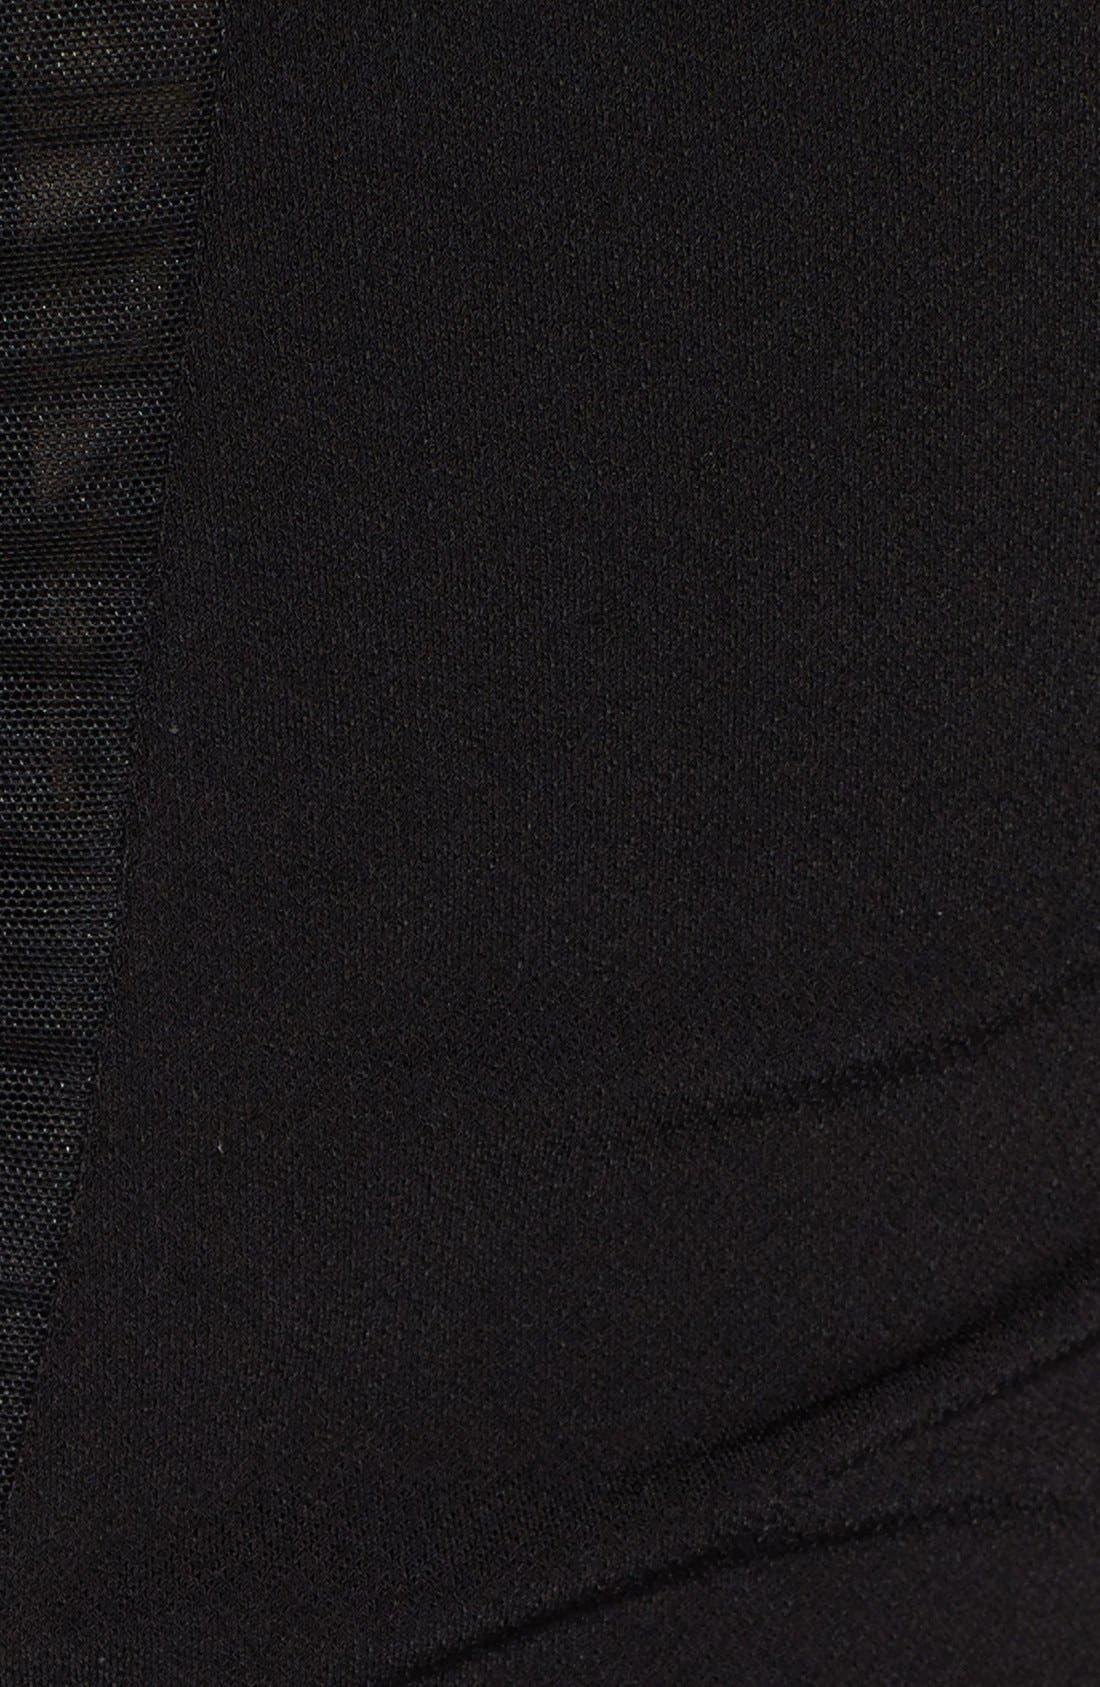 Alternate Image 3  - Alice + Olivia 'Maris' Sheer Sunburst Jersey Dress